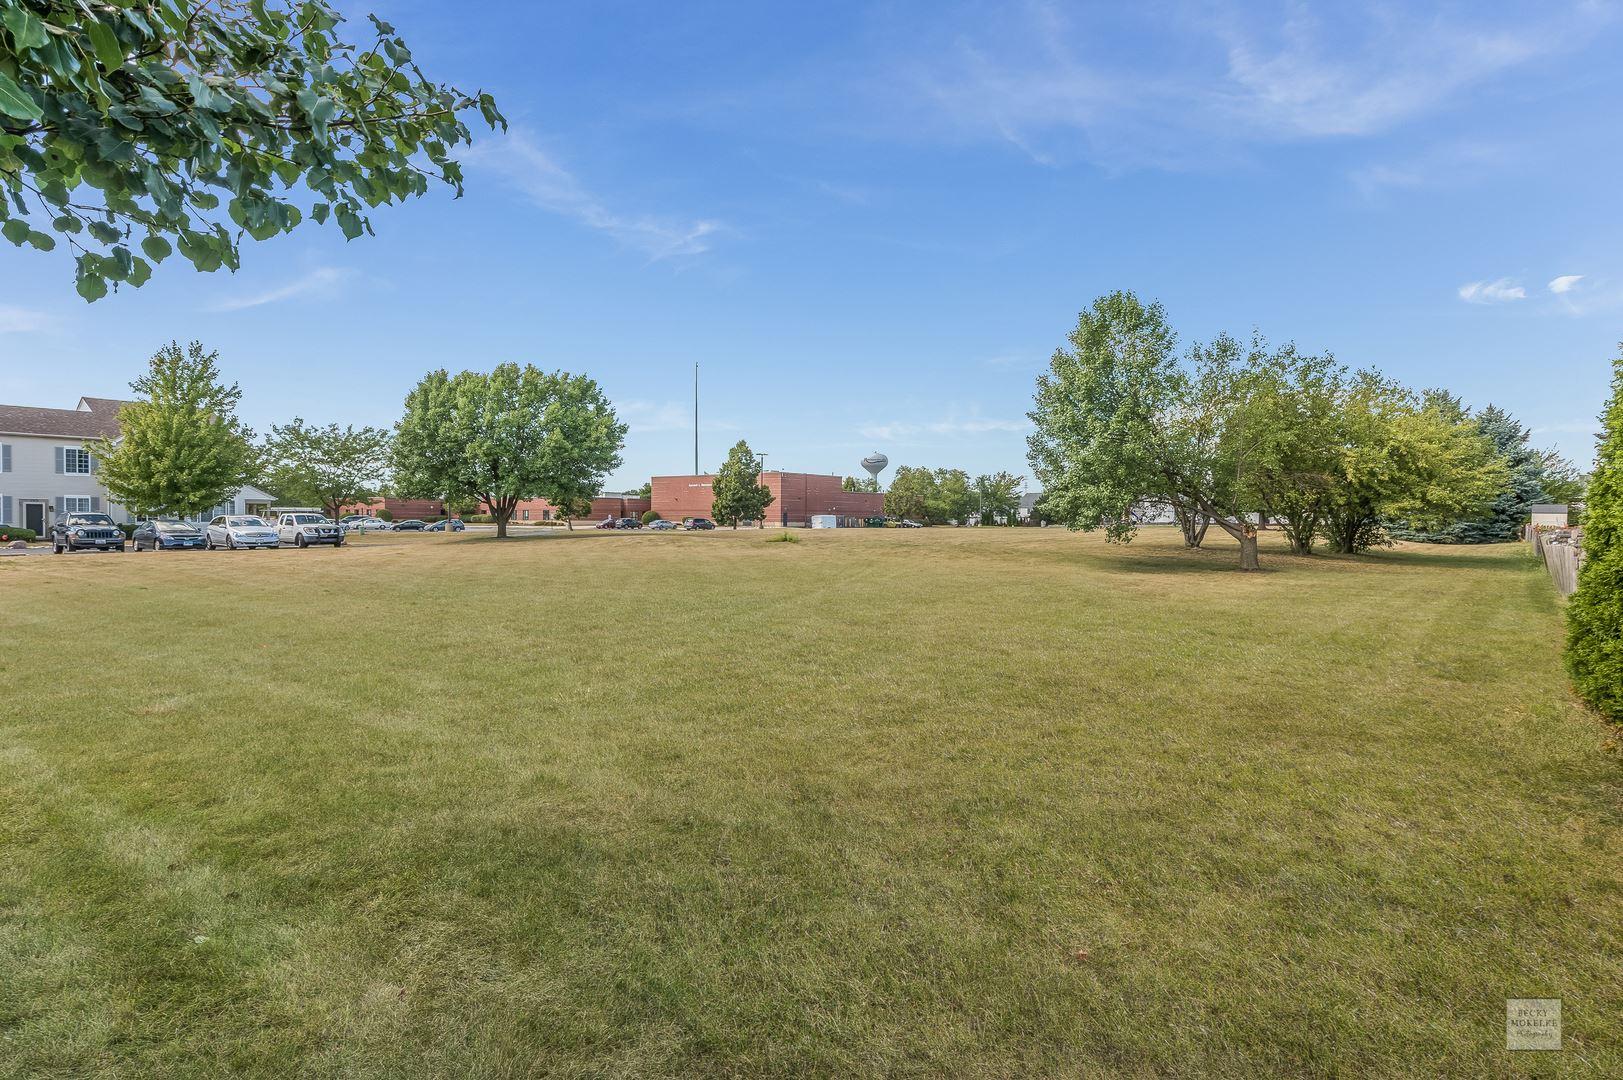 Photo of 124 Calendula Court, Romeoville, IL 60446 (MLS # 10848869)